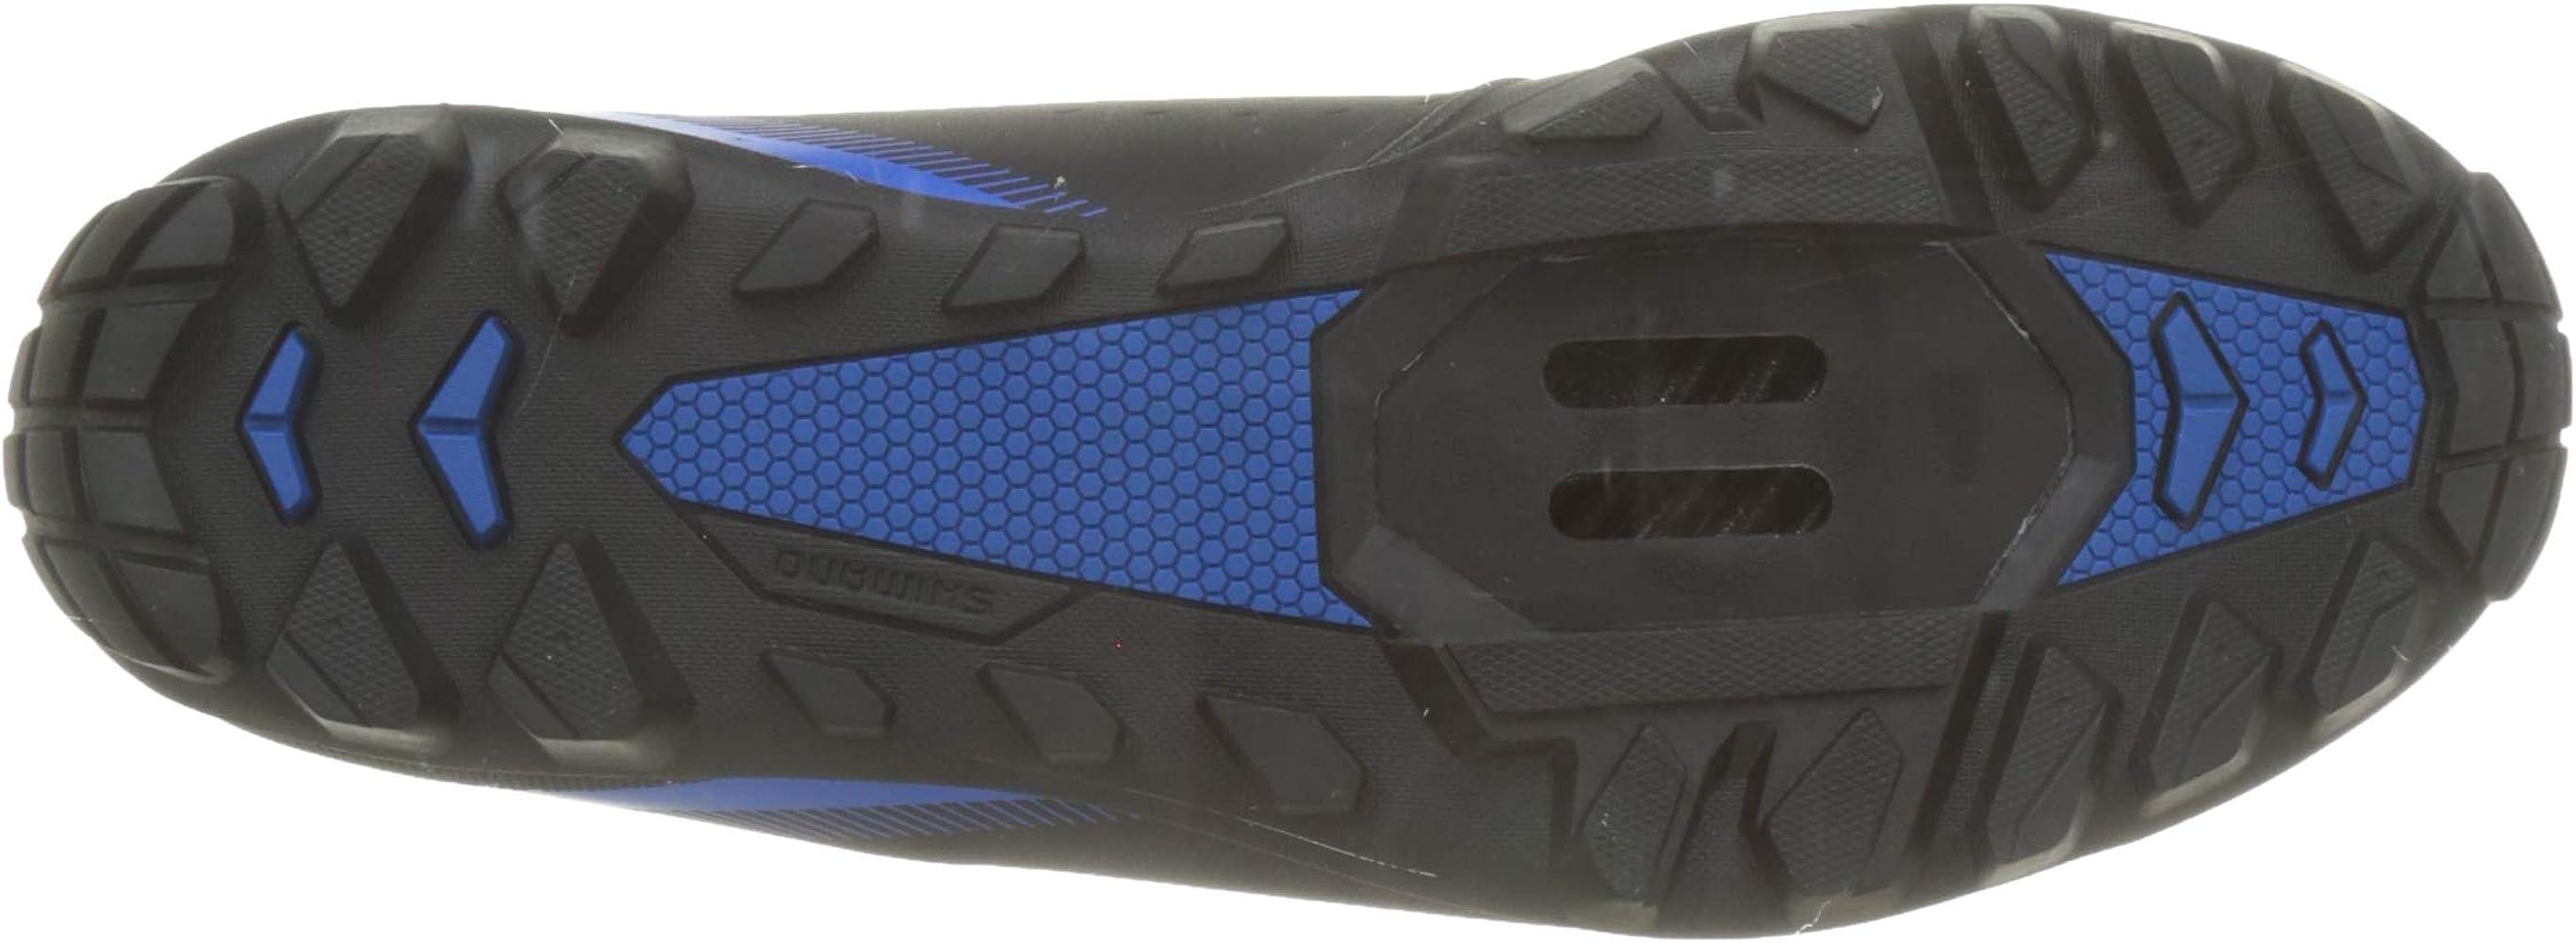 SHIMANO SH ME400 Schuhe BlackBlue Schuhgröße EU 40 2020 Rad